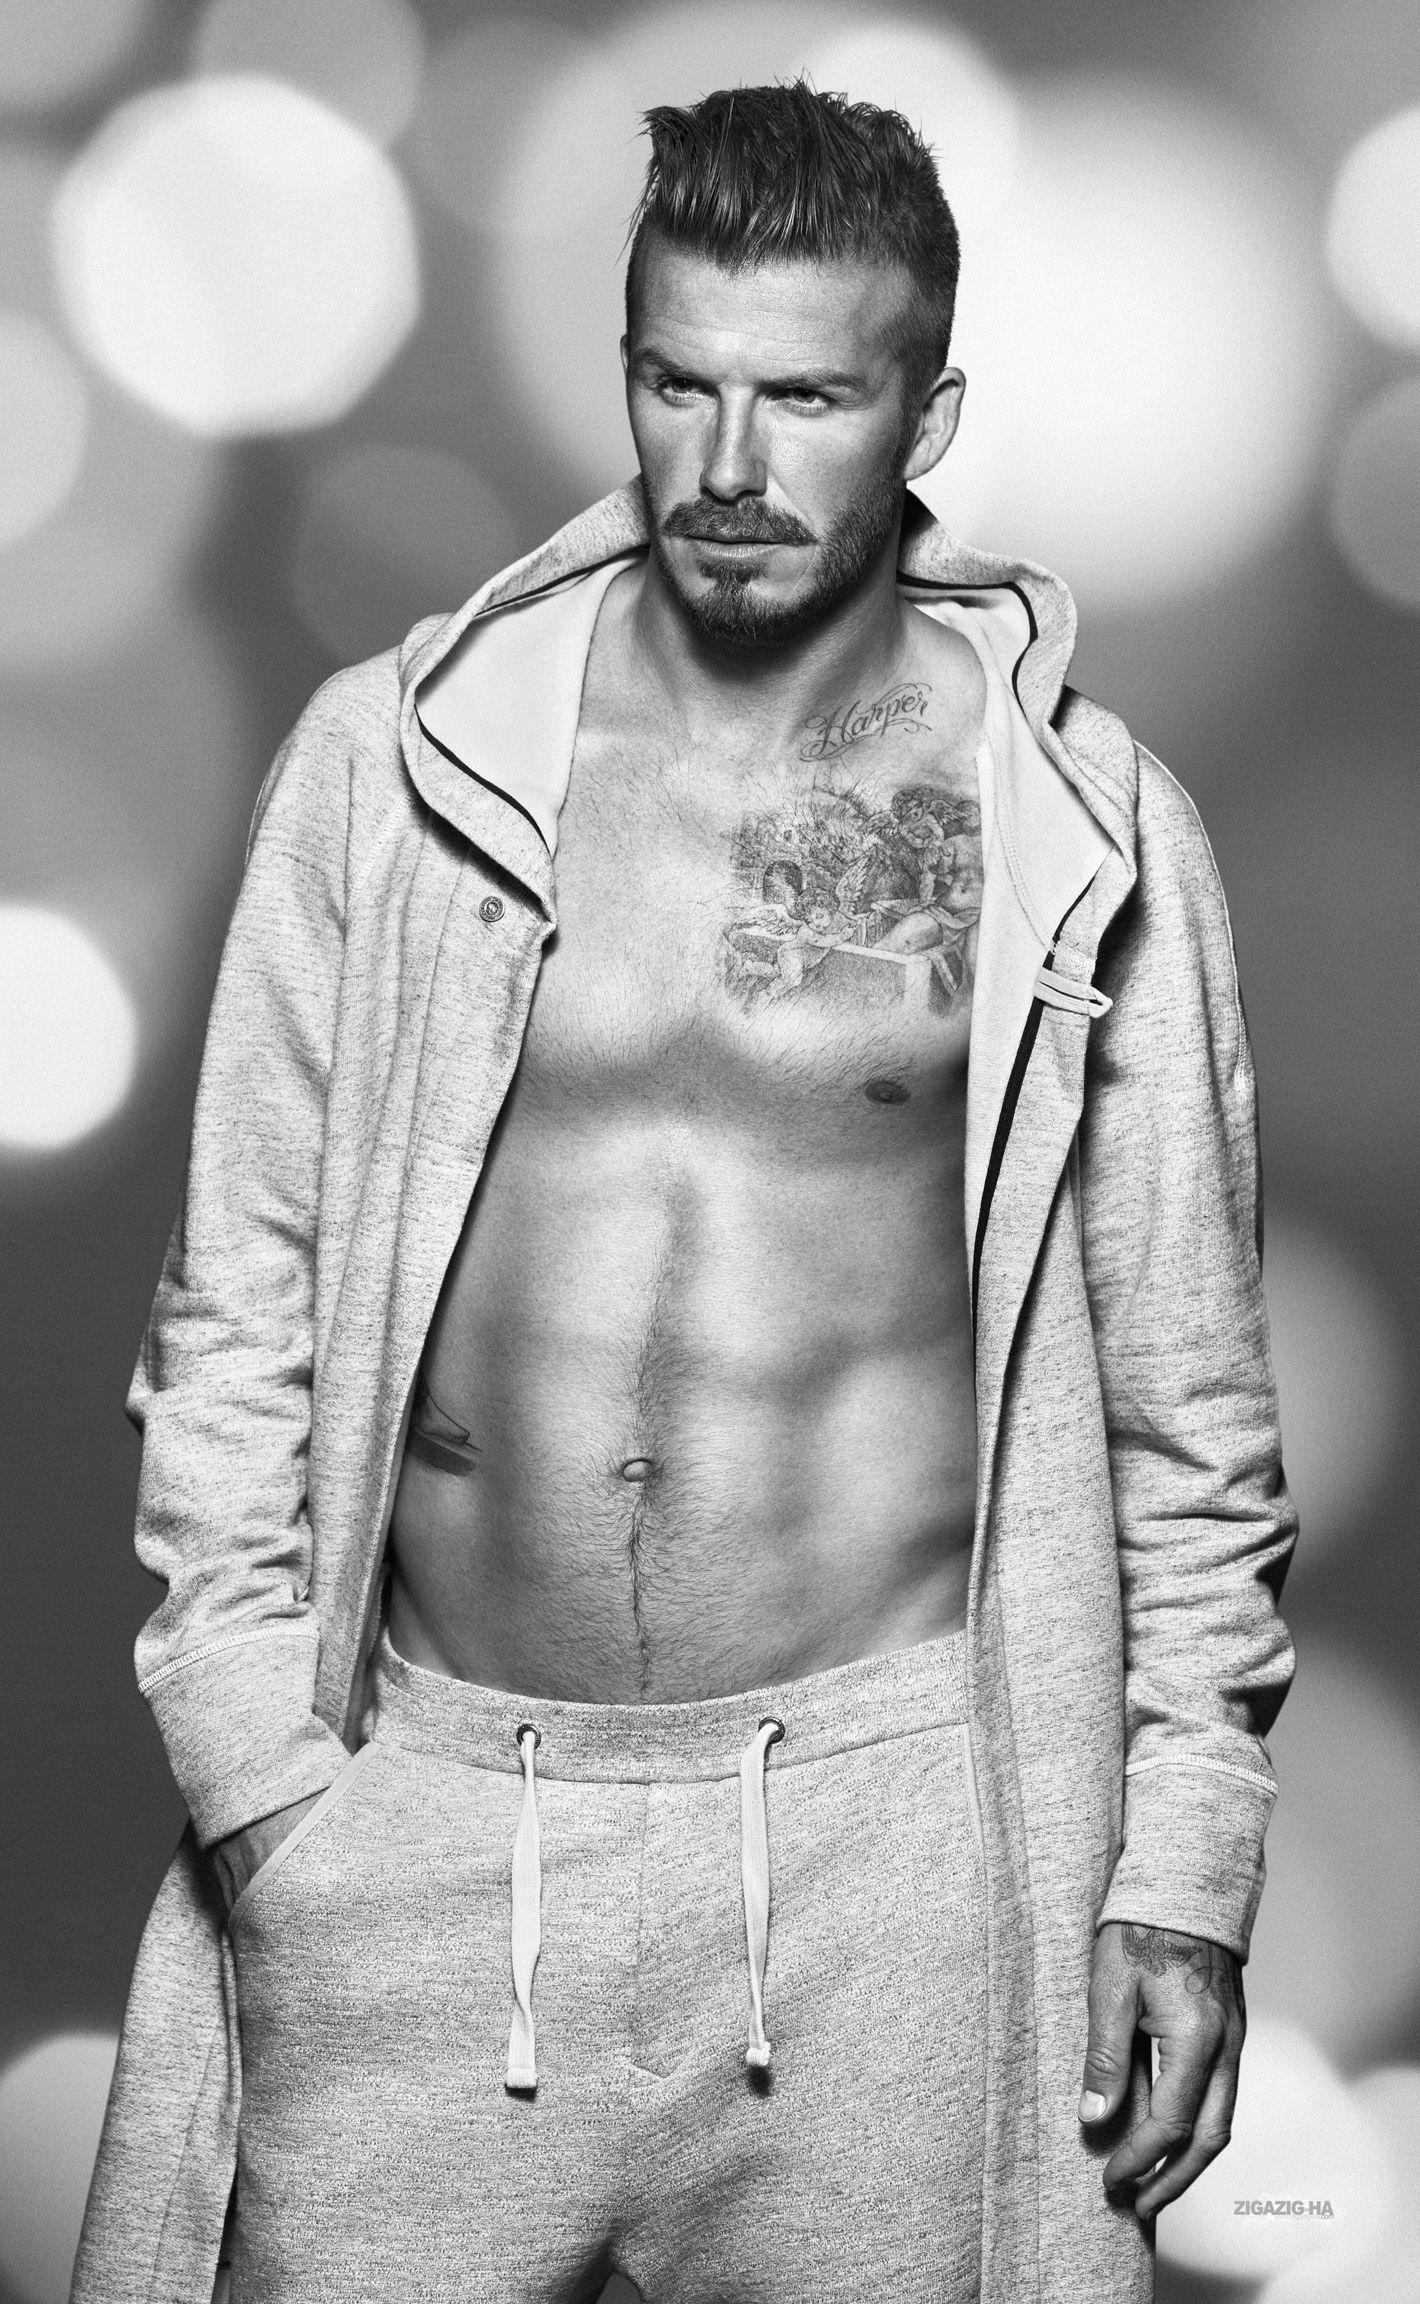 David-Beckham-H-M-Underwear-Christmas-collection-2012-david-beckham-32720021-1420-2304